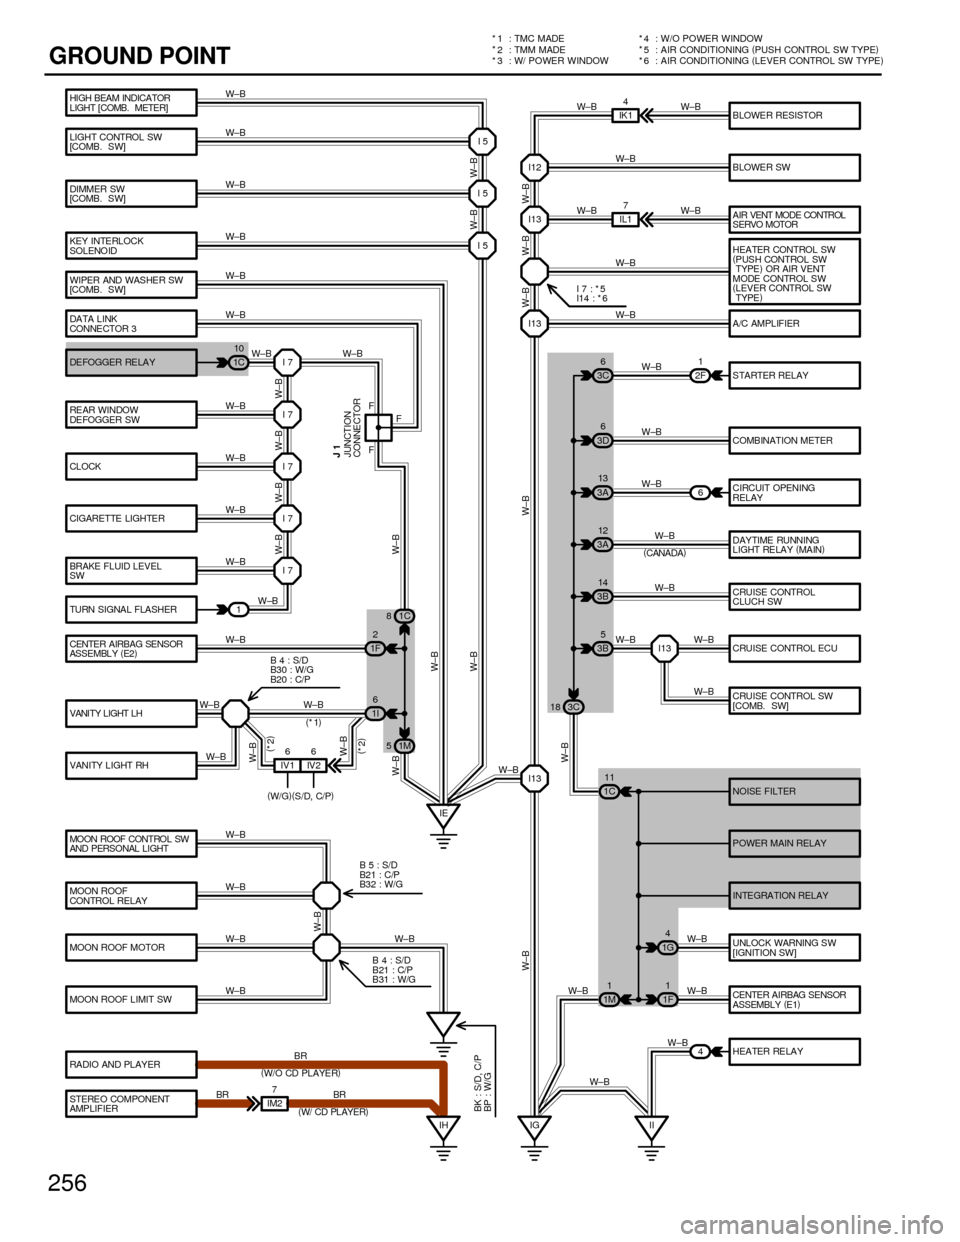 1994 Toyota Camry Radio Wiring Diagram